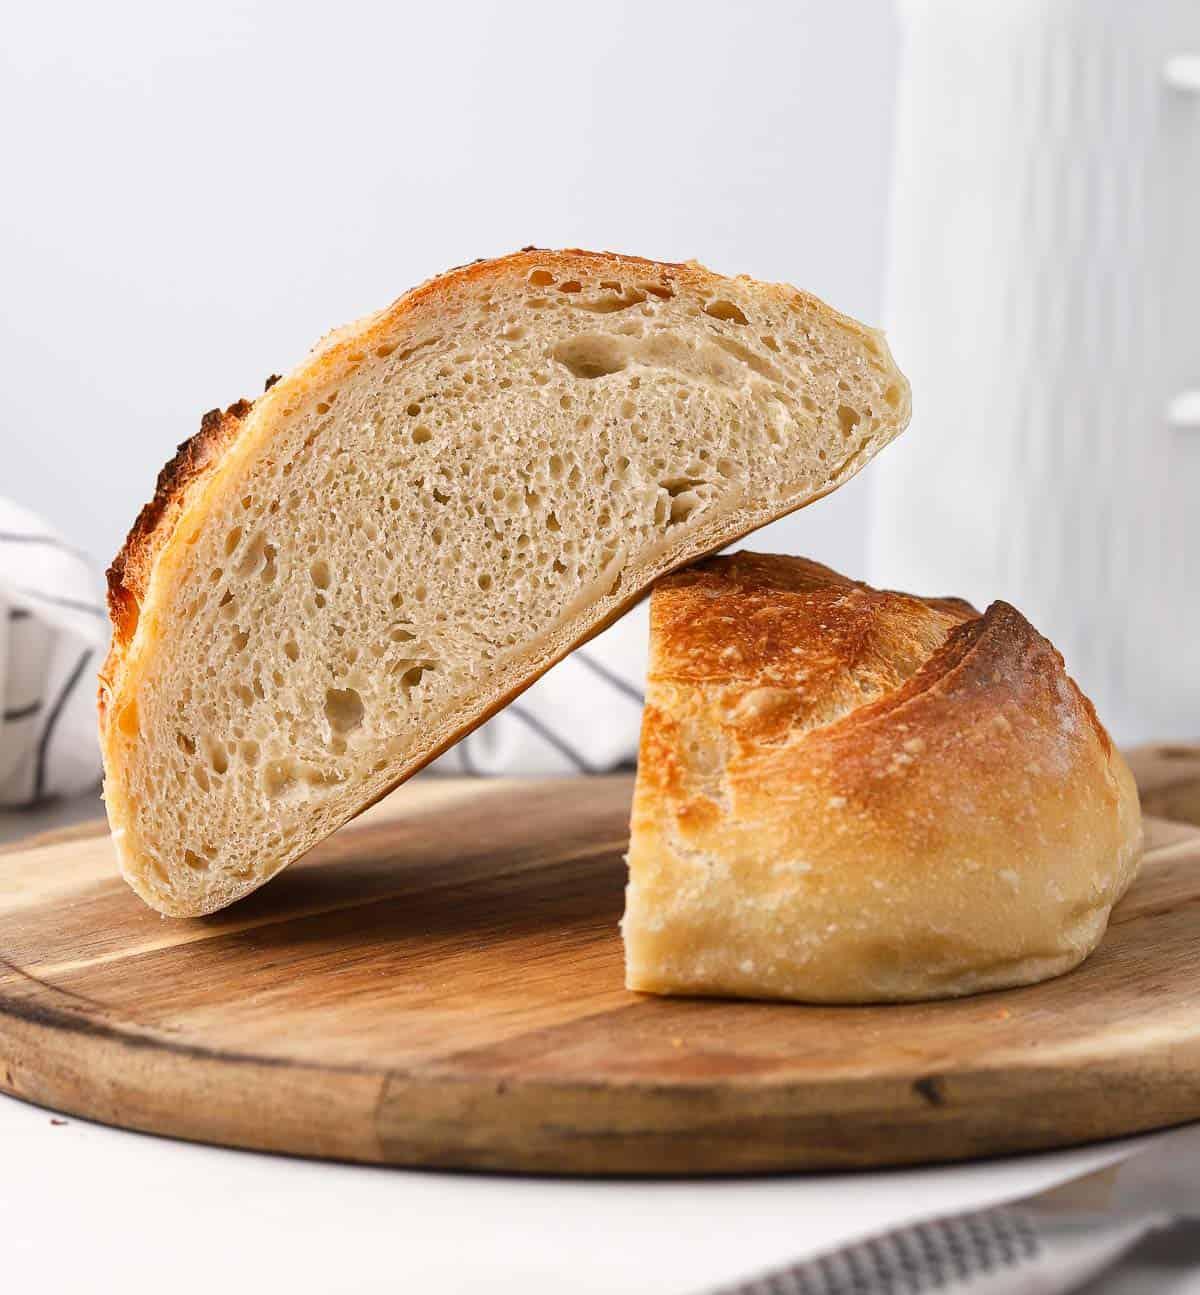 Two bread halves on a wooden board.